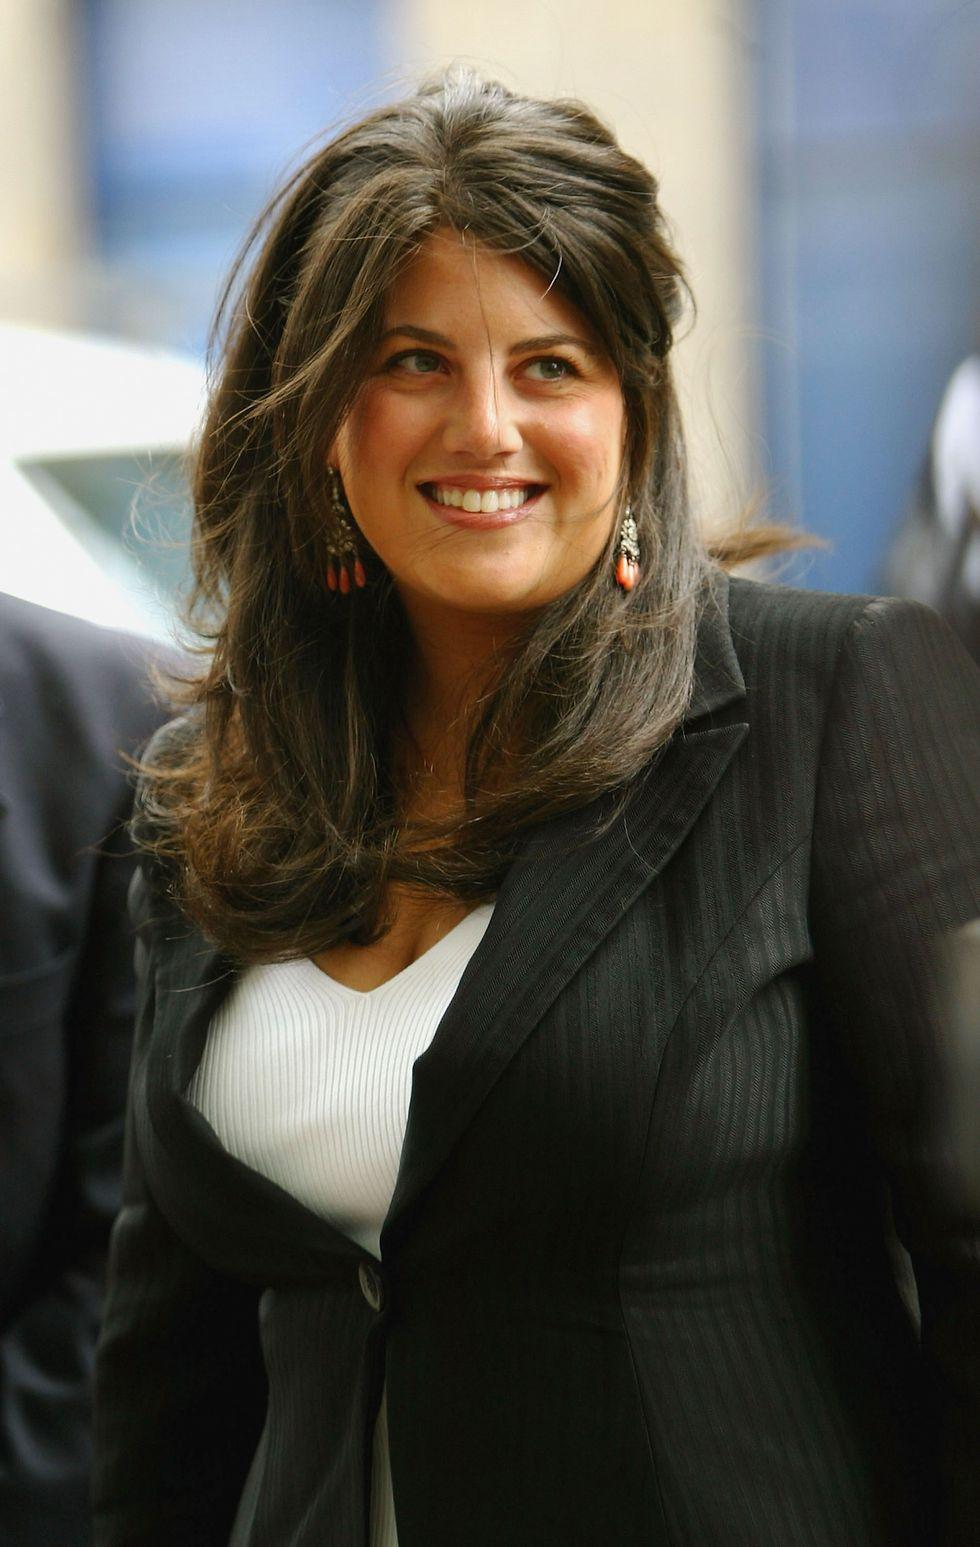 All'asta la biancheria intima di Monica Lewinsky